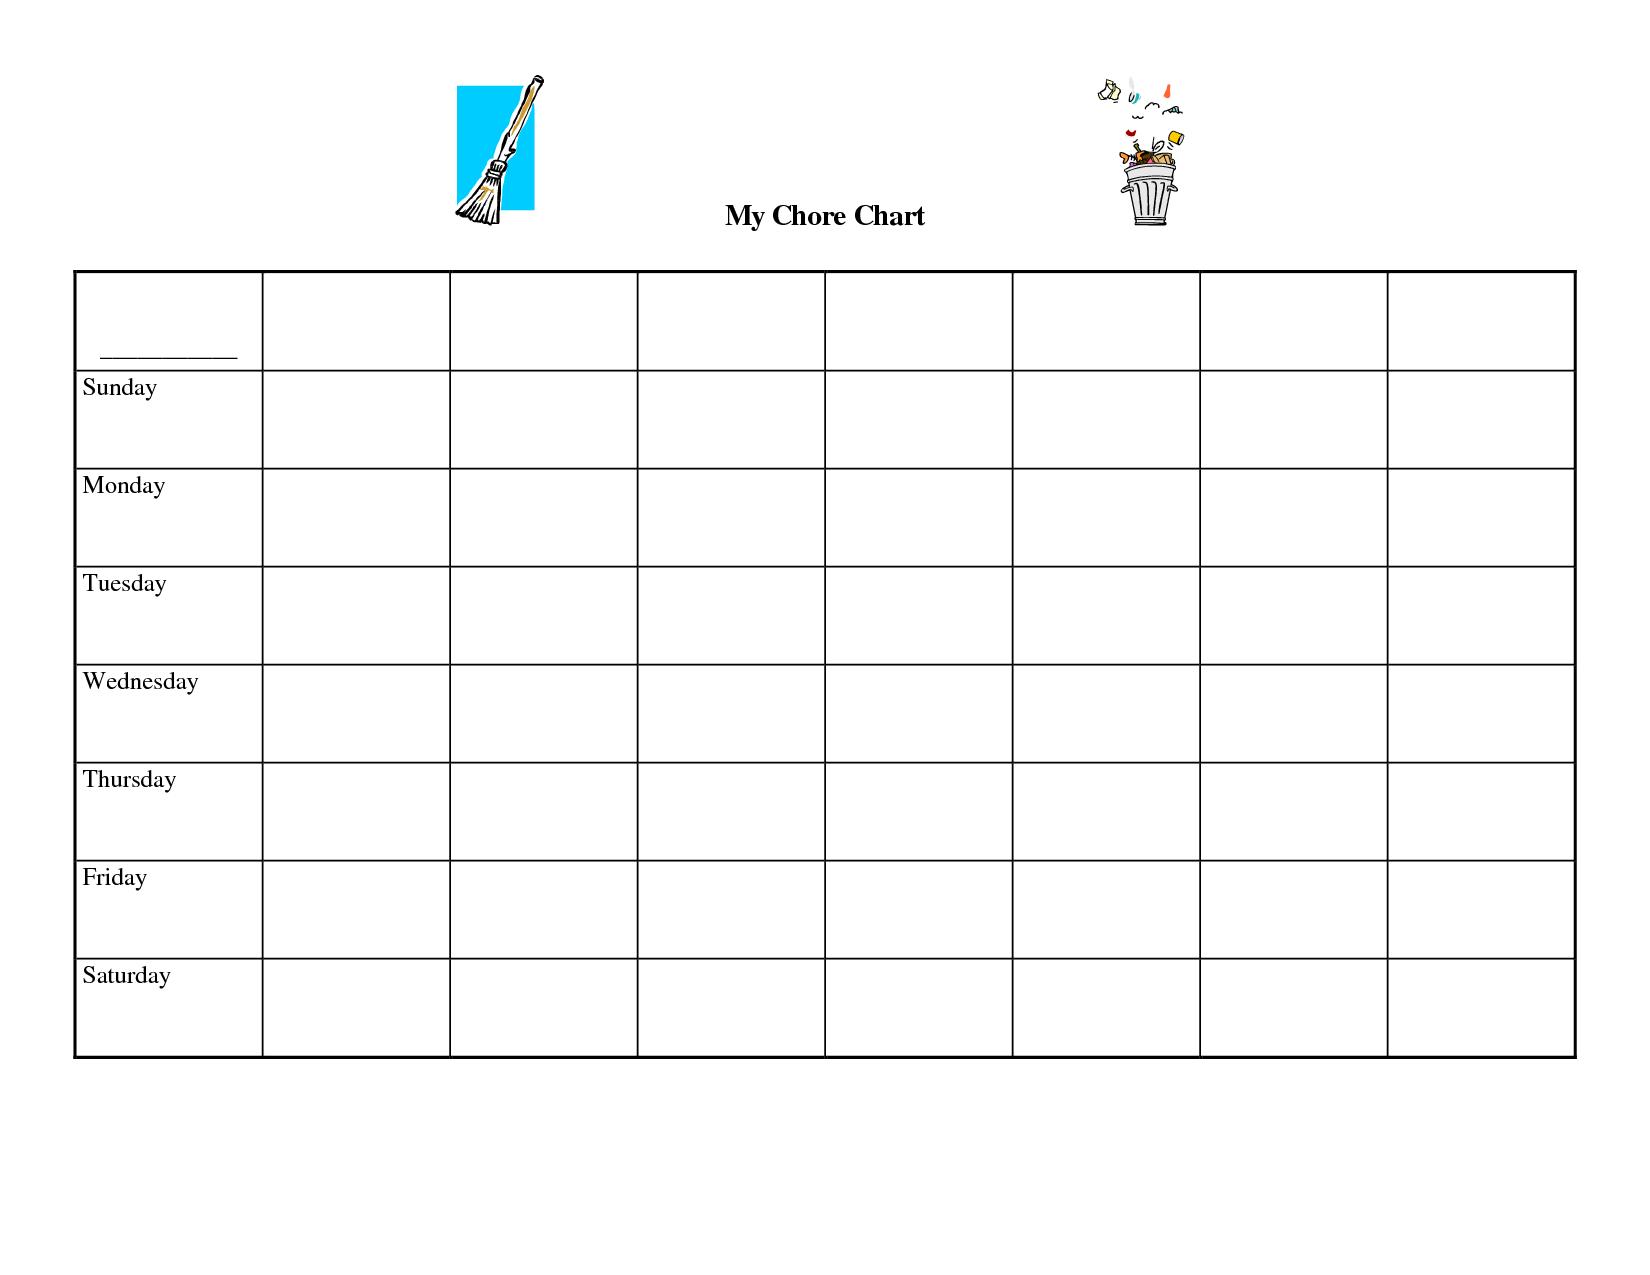 Free Printable Blank Chore Chart Templates Printable Chart Free Printable Chore Charts Printable Chore Chart